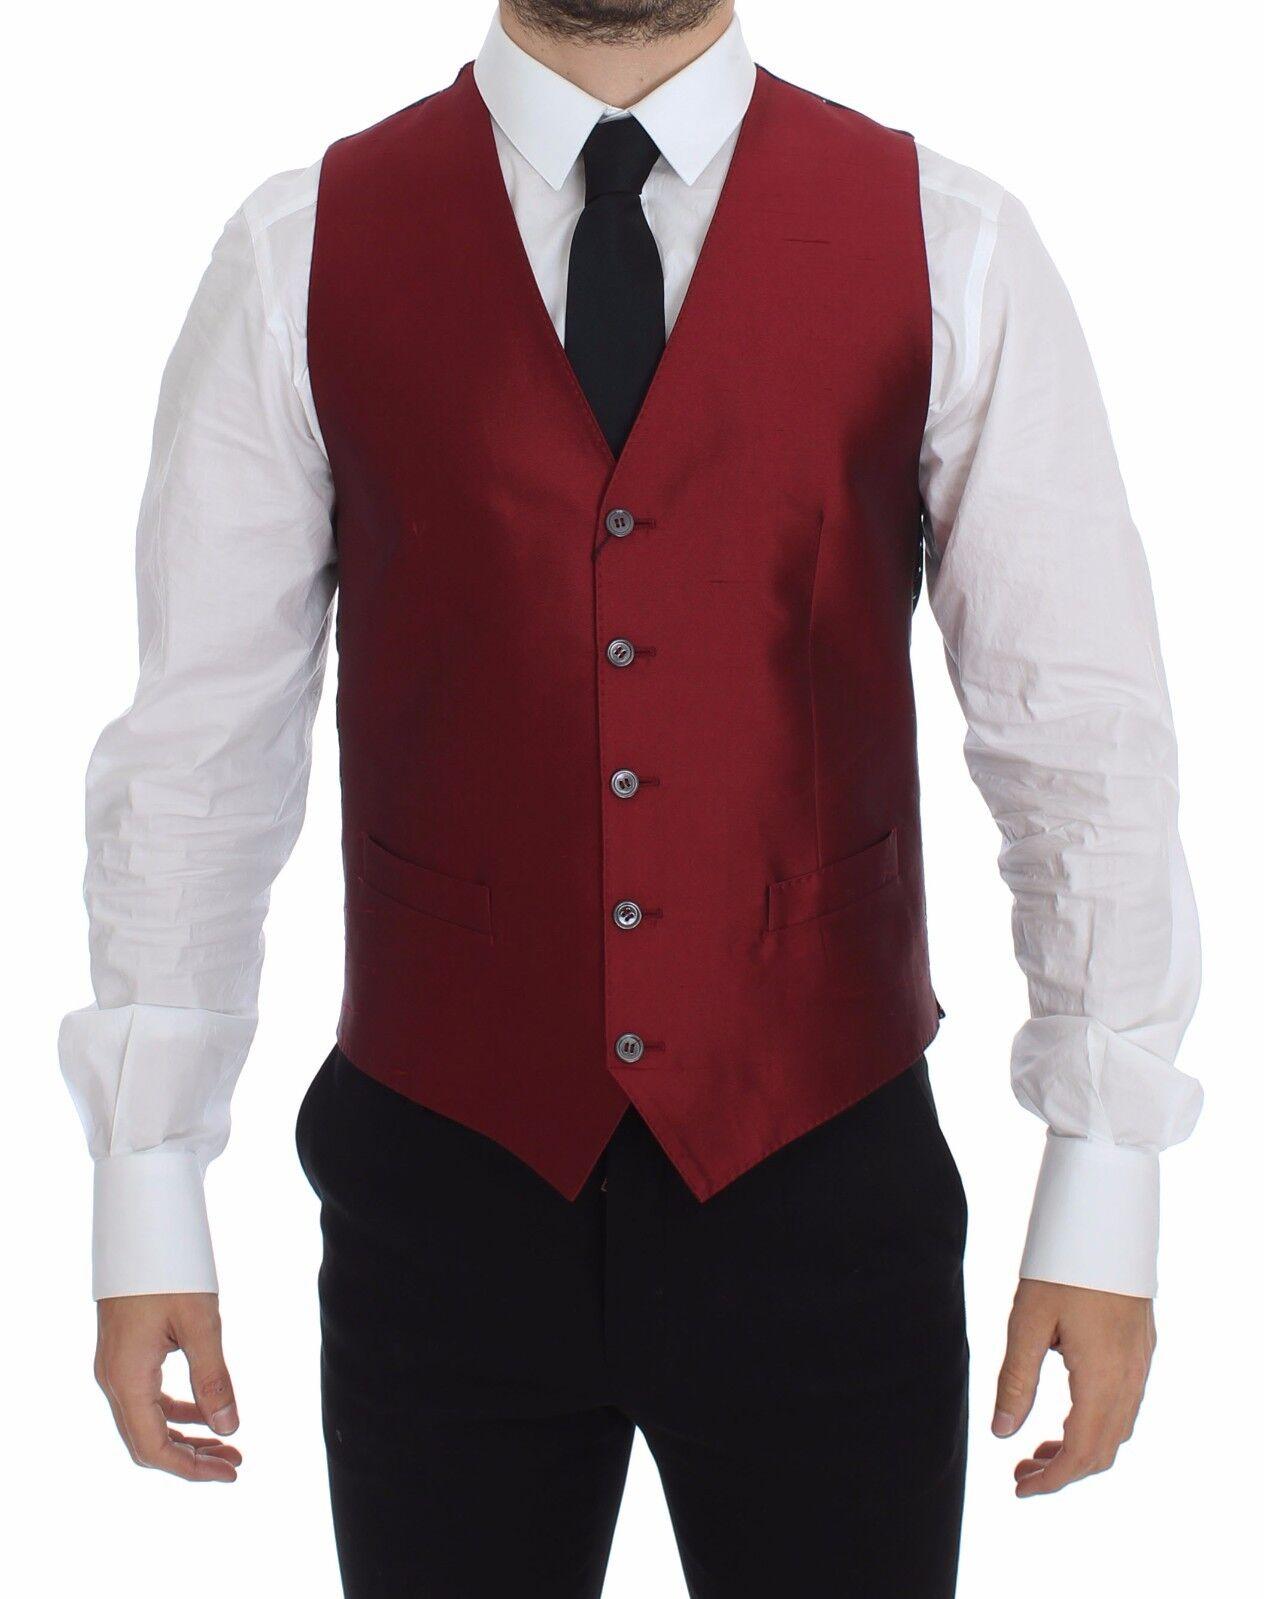 NEW 600 DOLCE & GABBANA Vest Waistcoat ROT Silk Dress Blazer IT52 / US42 / XL